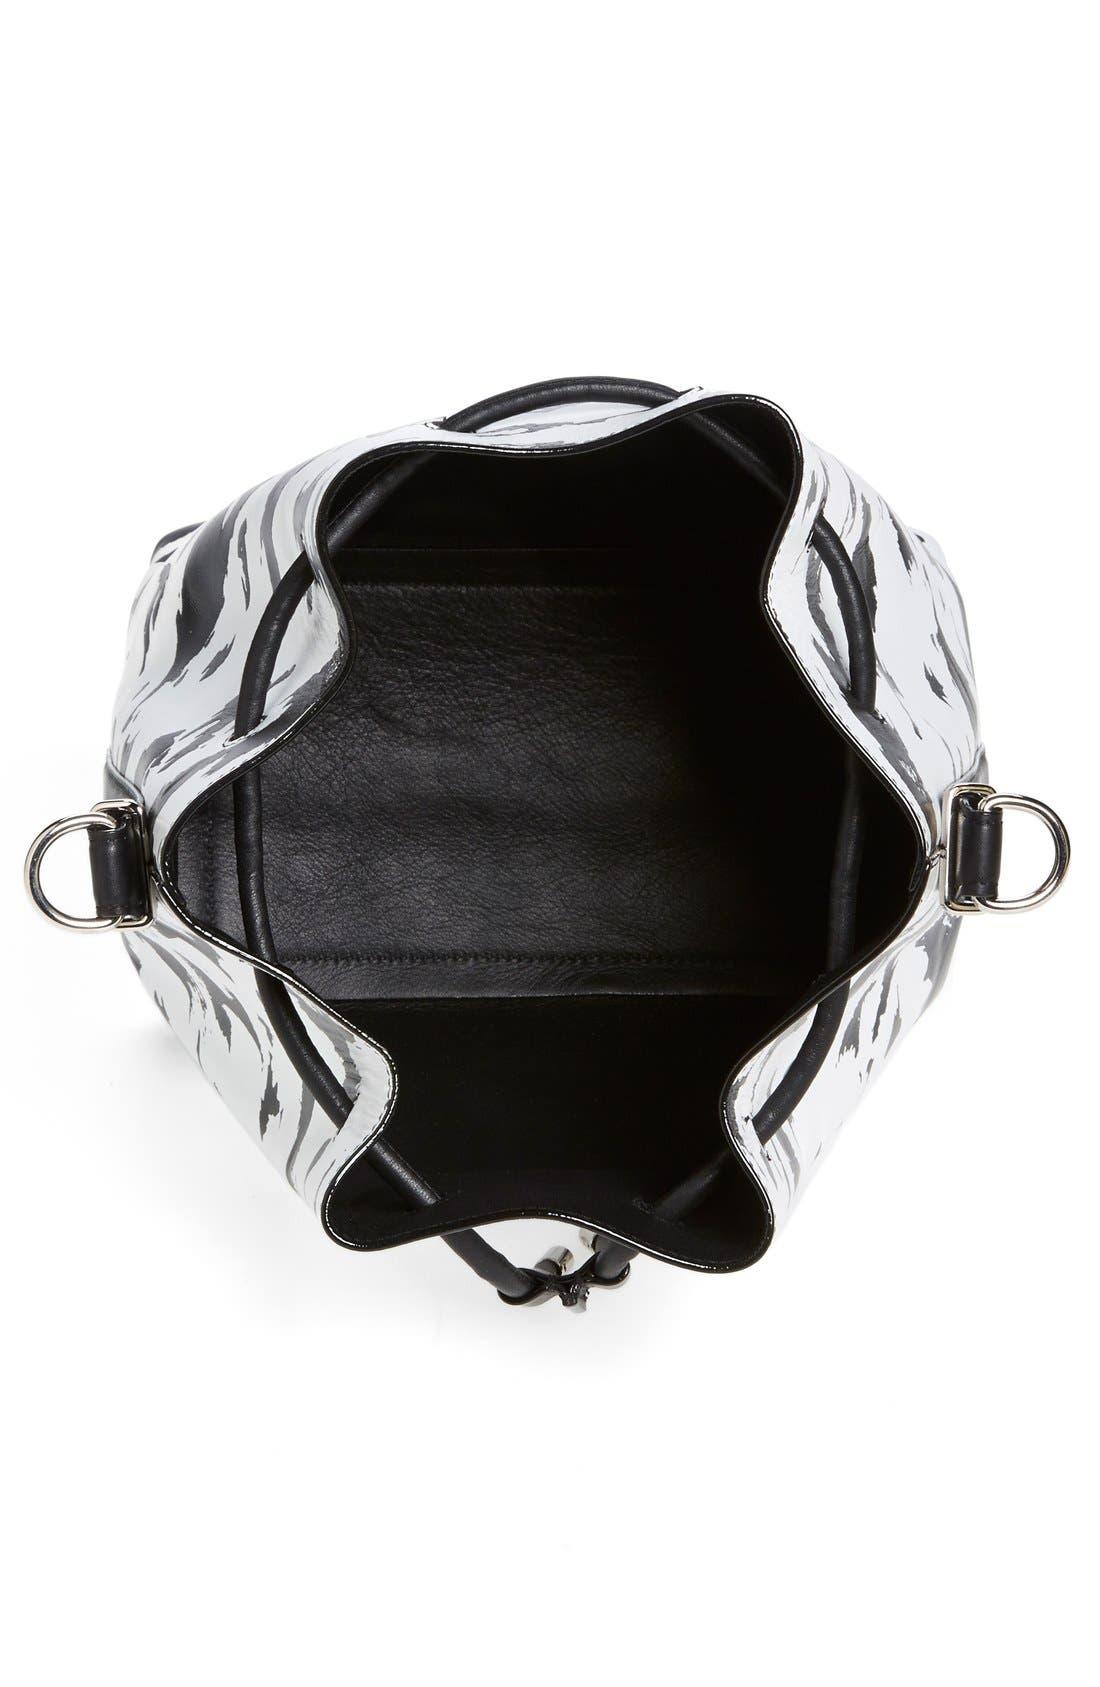 Alternate Image 2  - Proenza Schouler 'Medium' Feather Print Leather Bucket Bag